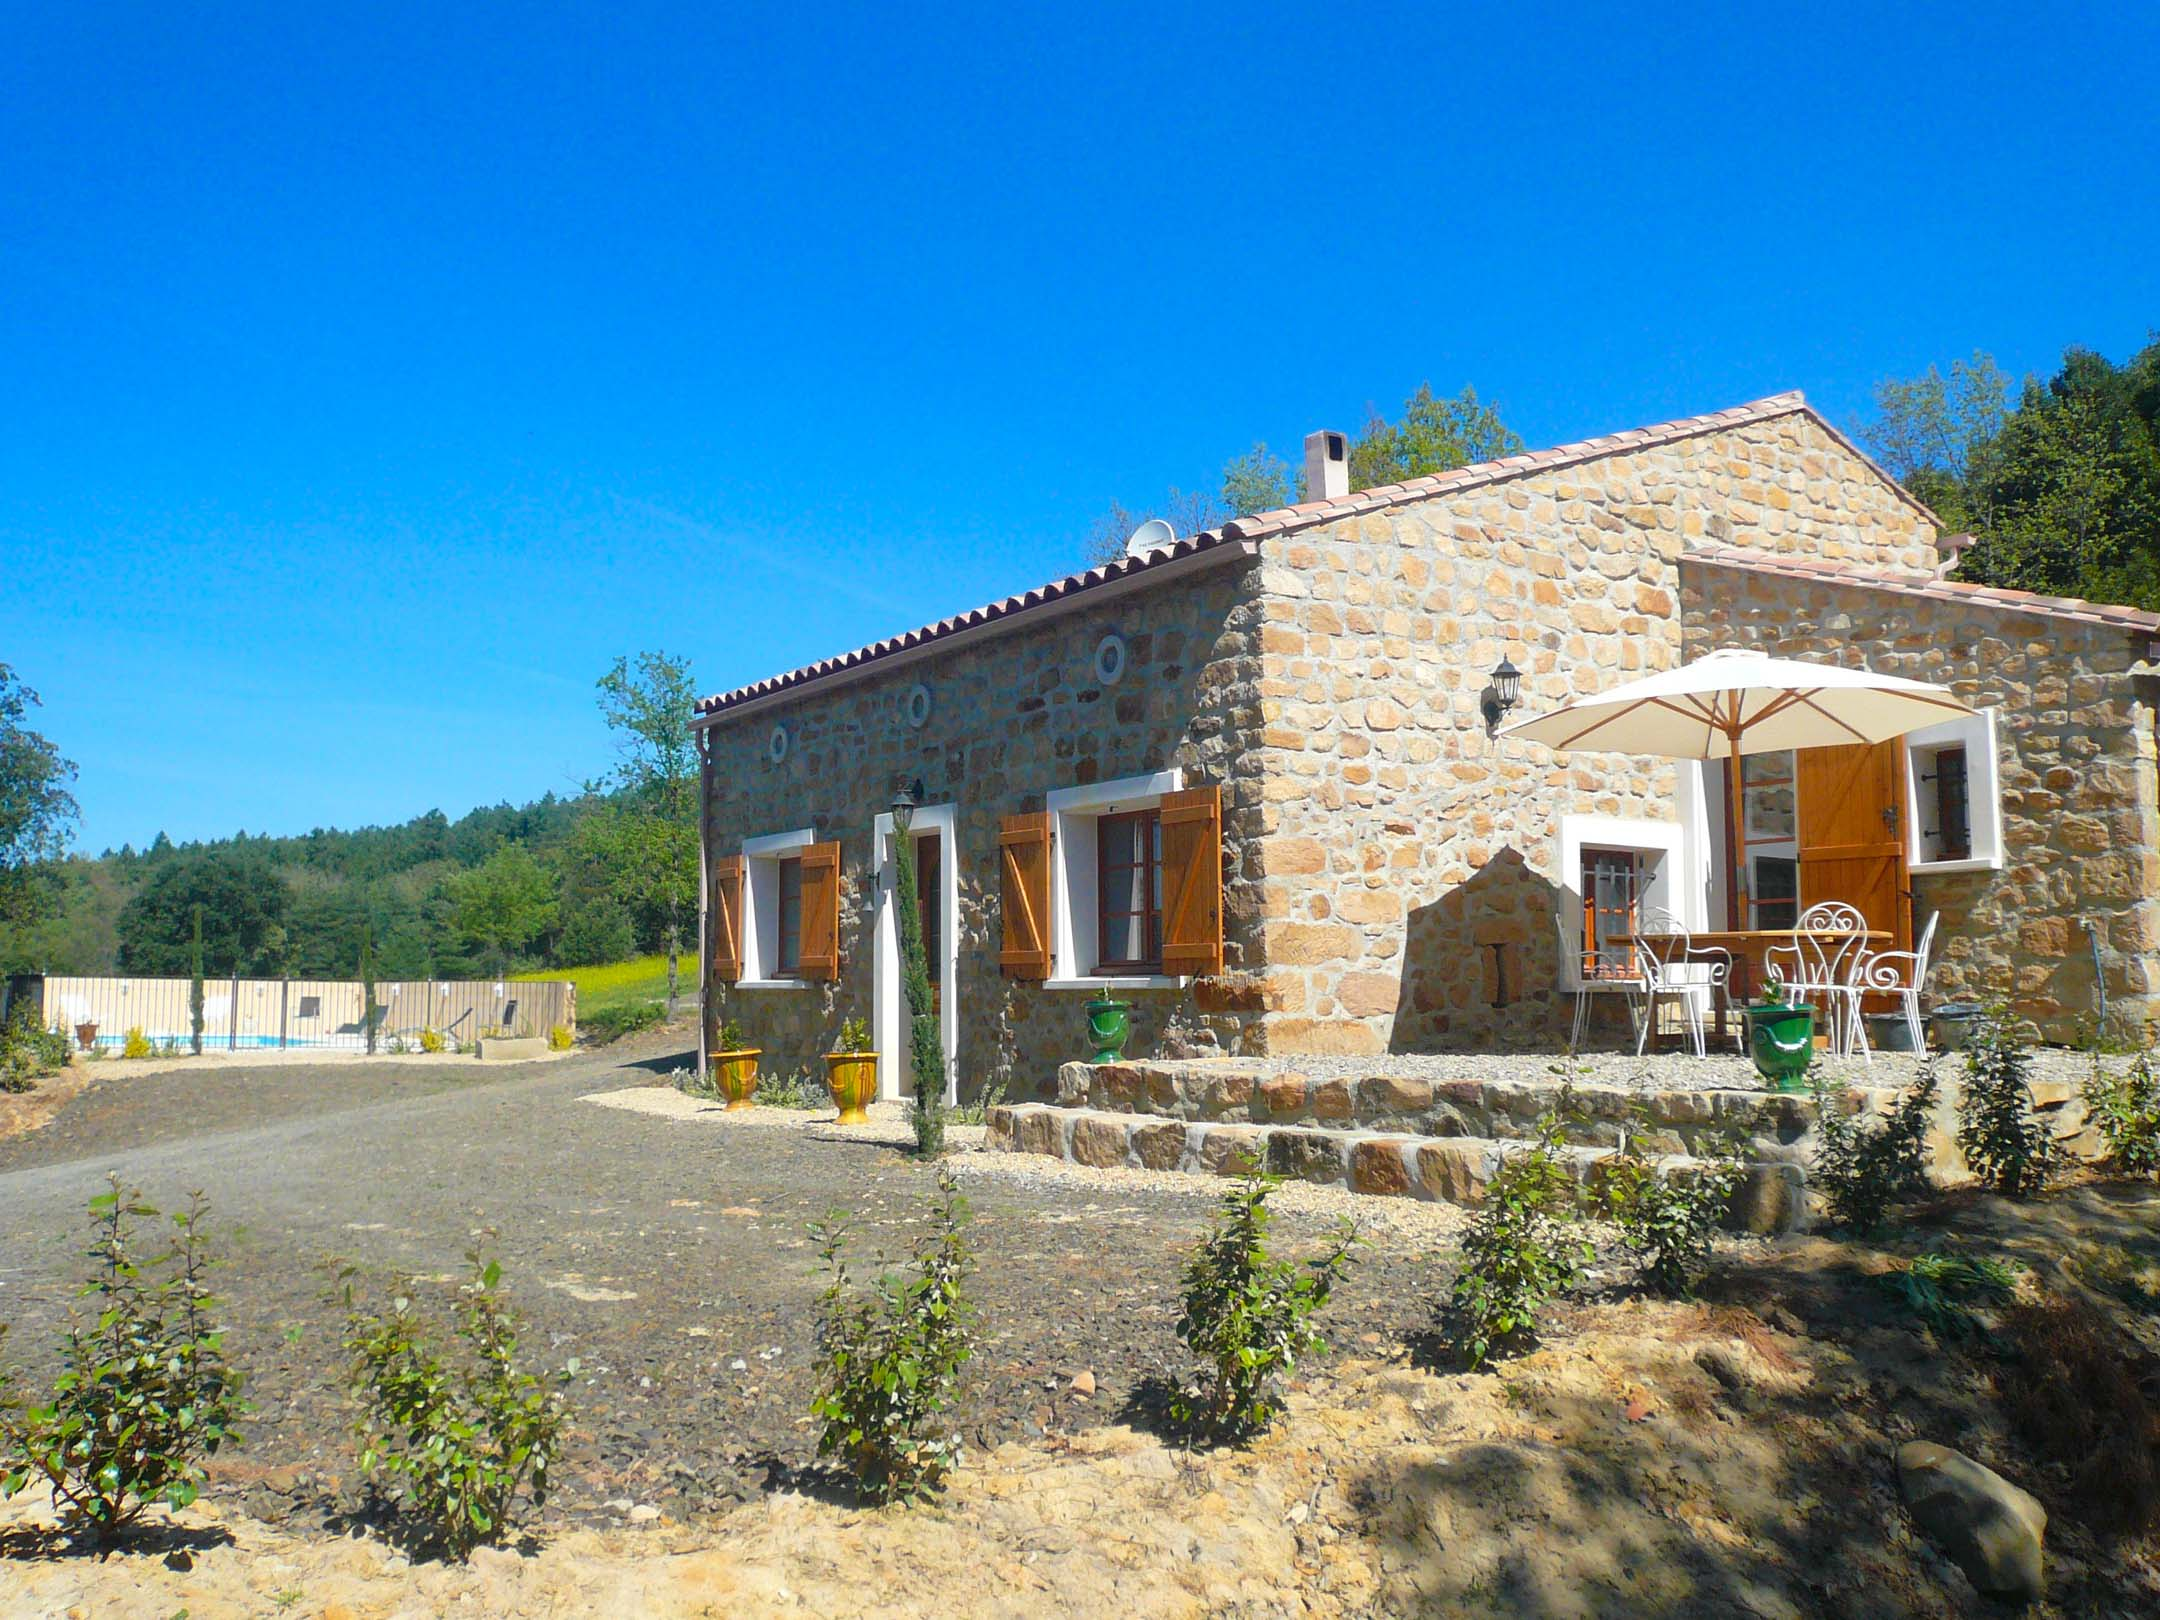 location maisons villas sud France AR11  Gite AMIOTE